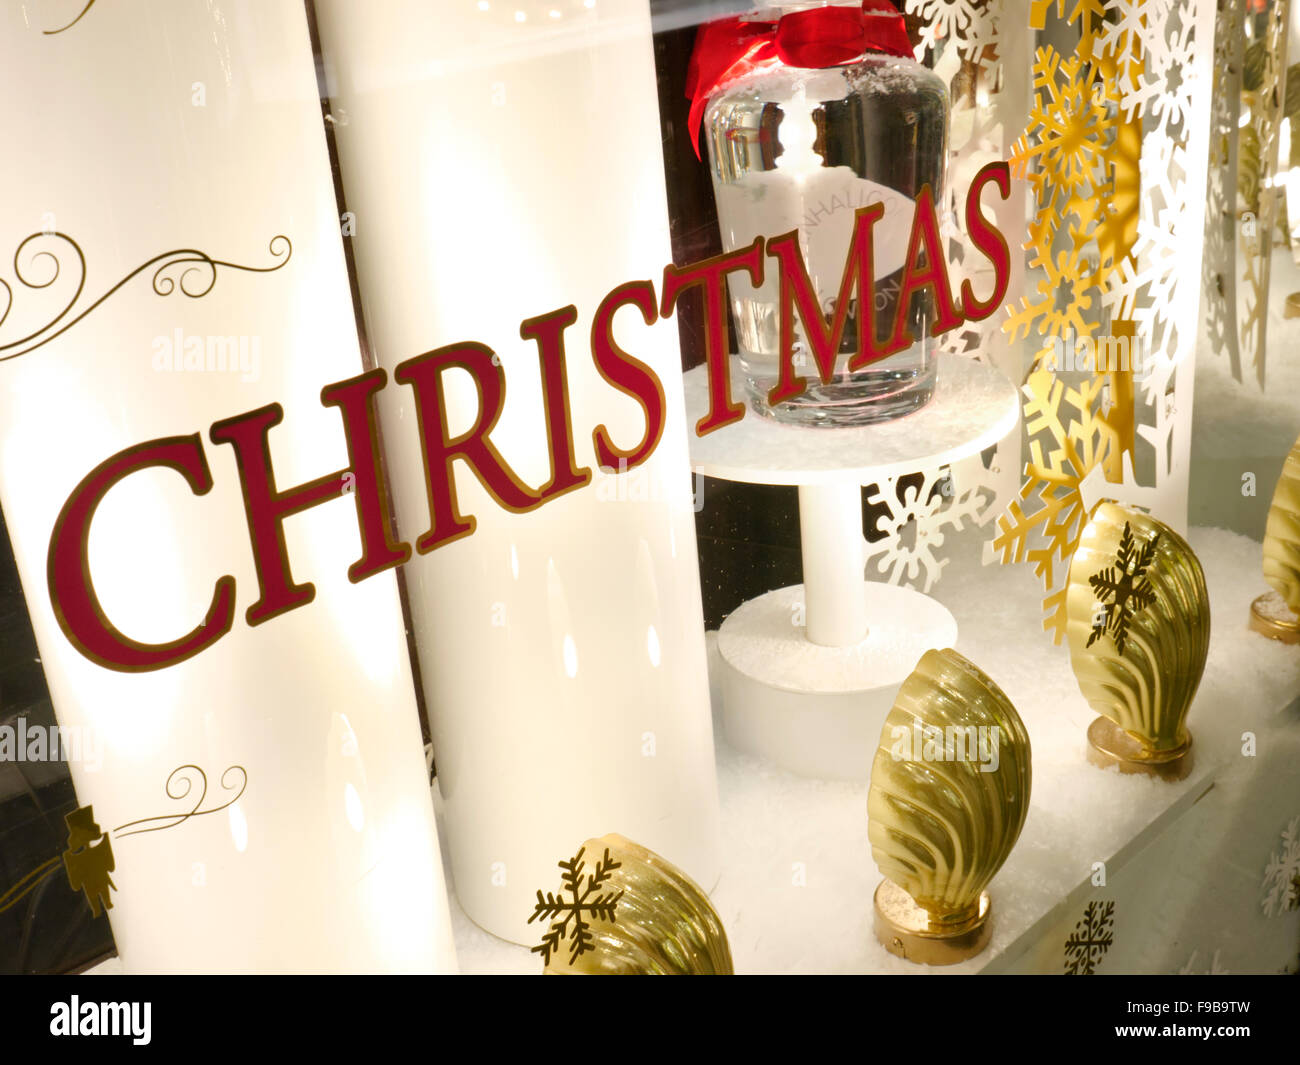 Christmas Shop Stock Photos & Christmas Shop Stock Images - Alamy